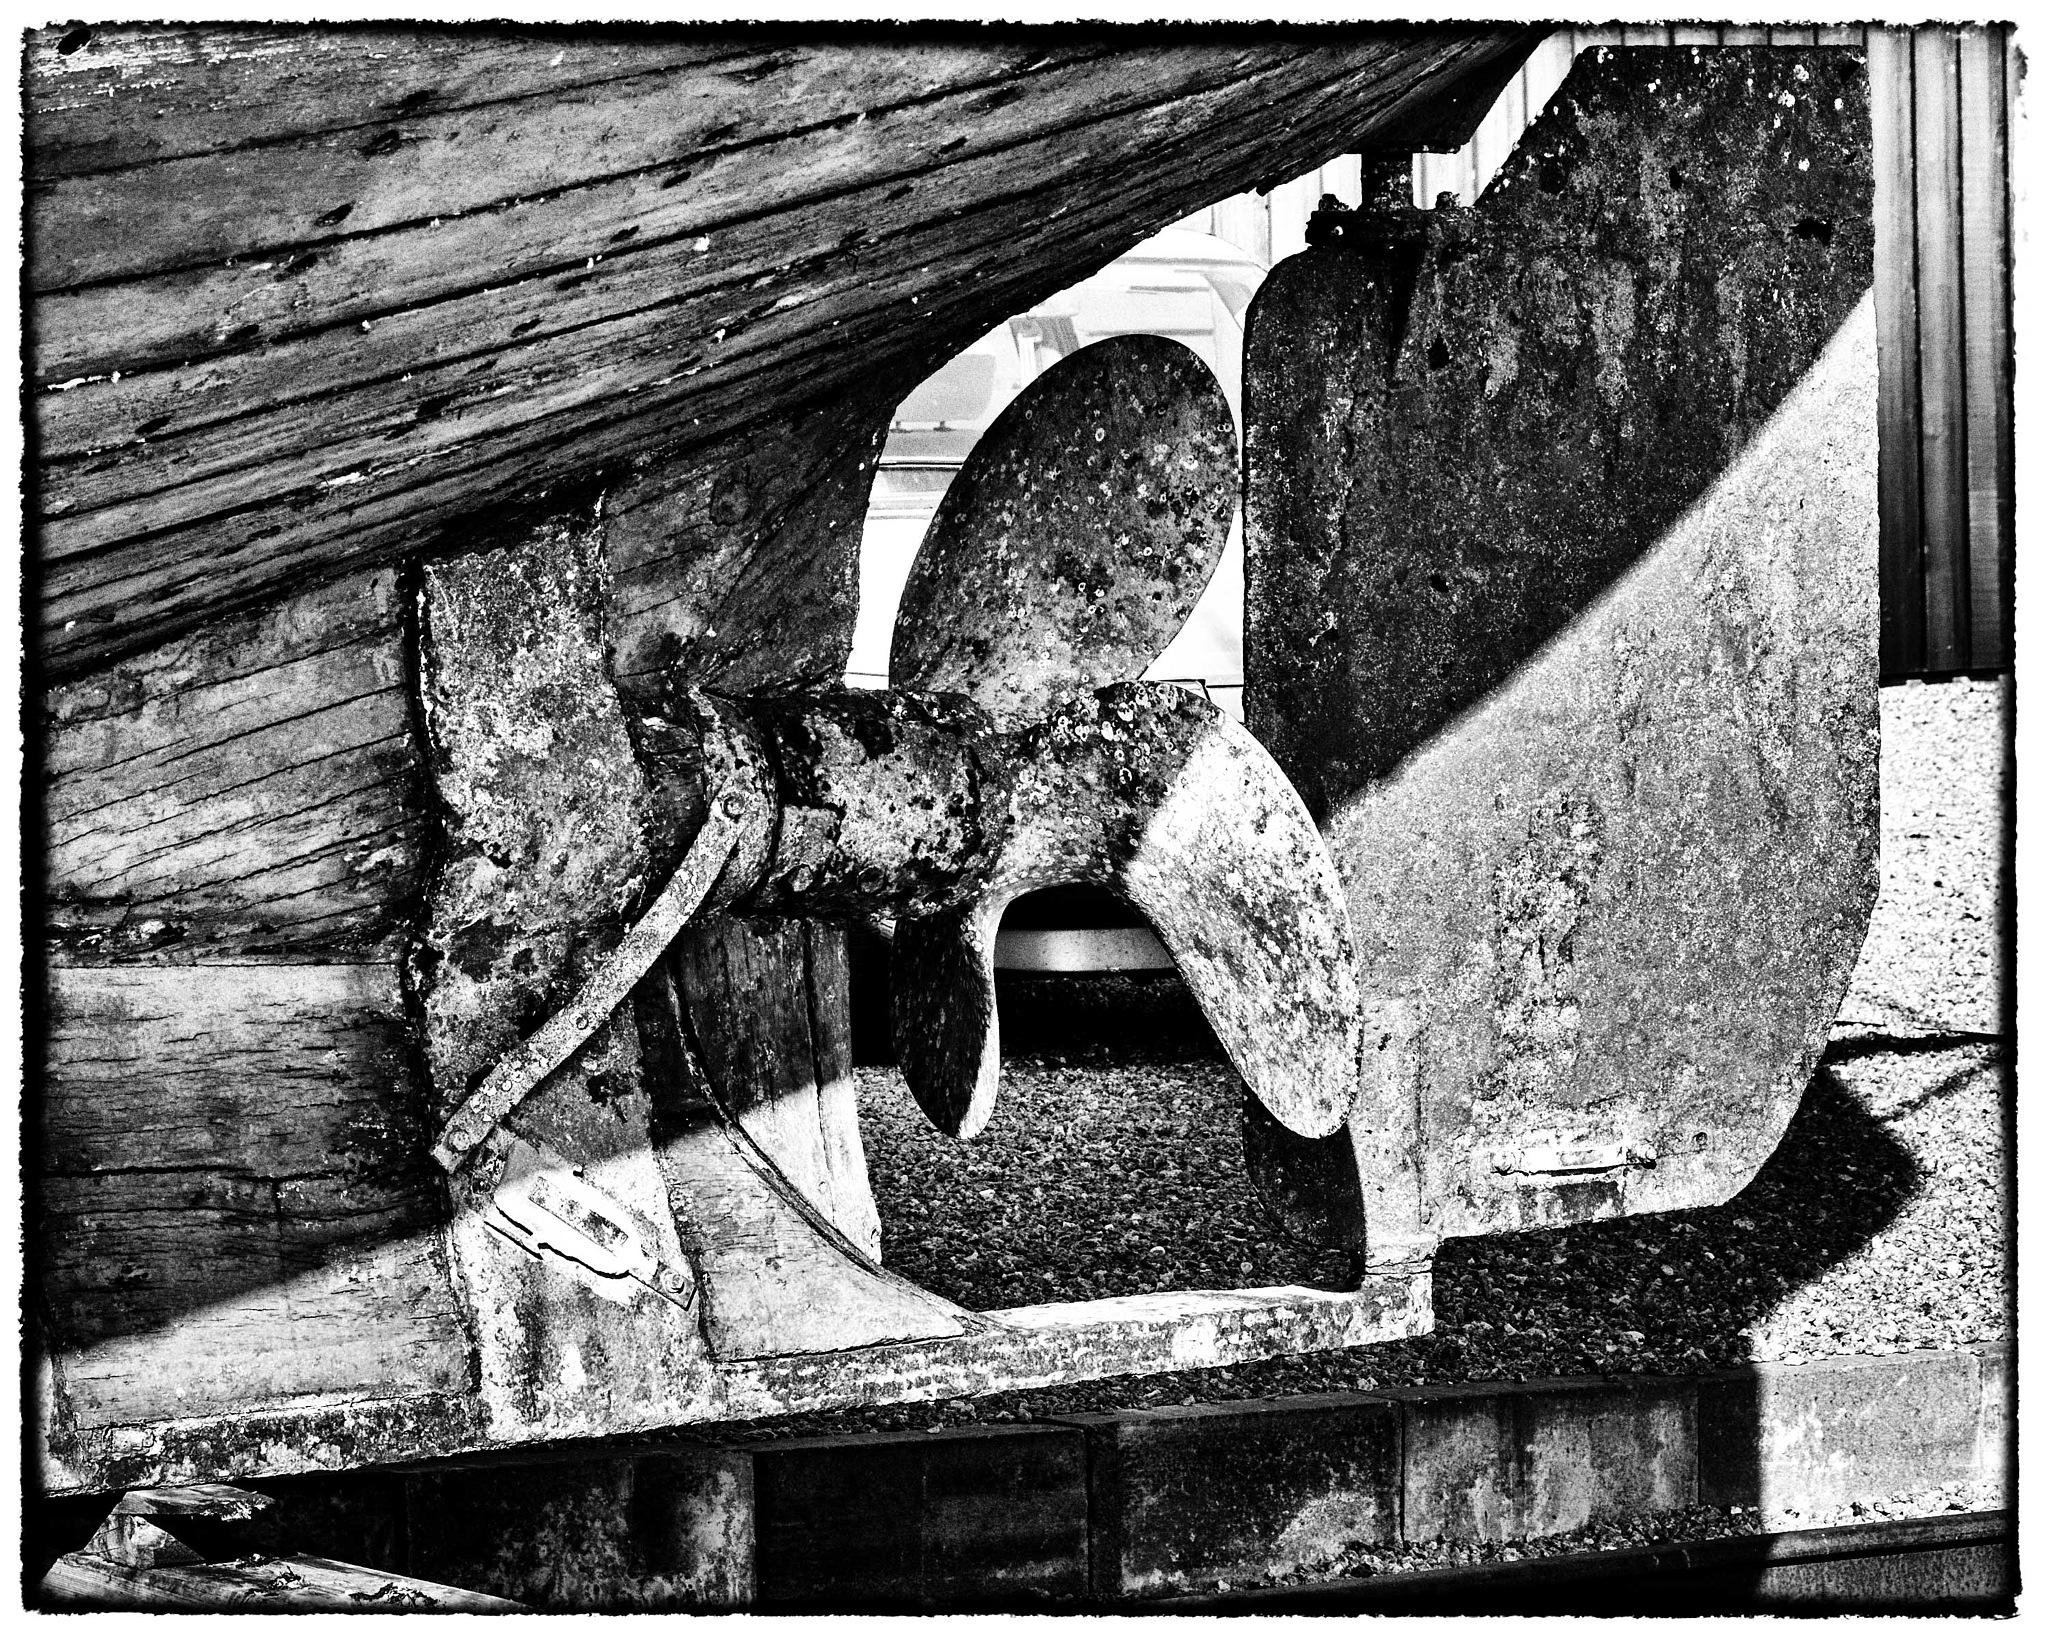 Ship Screw by Preben Schmidt